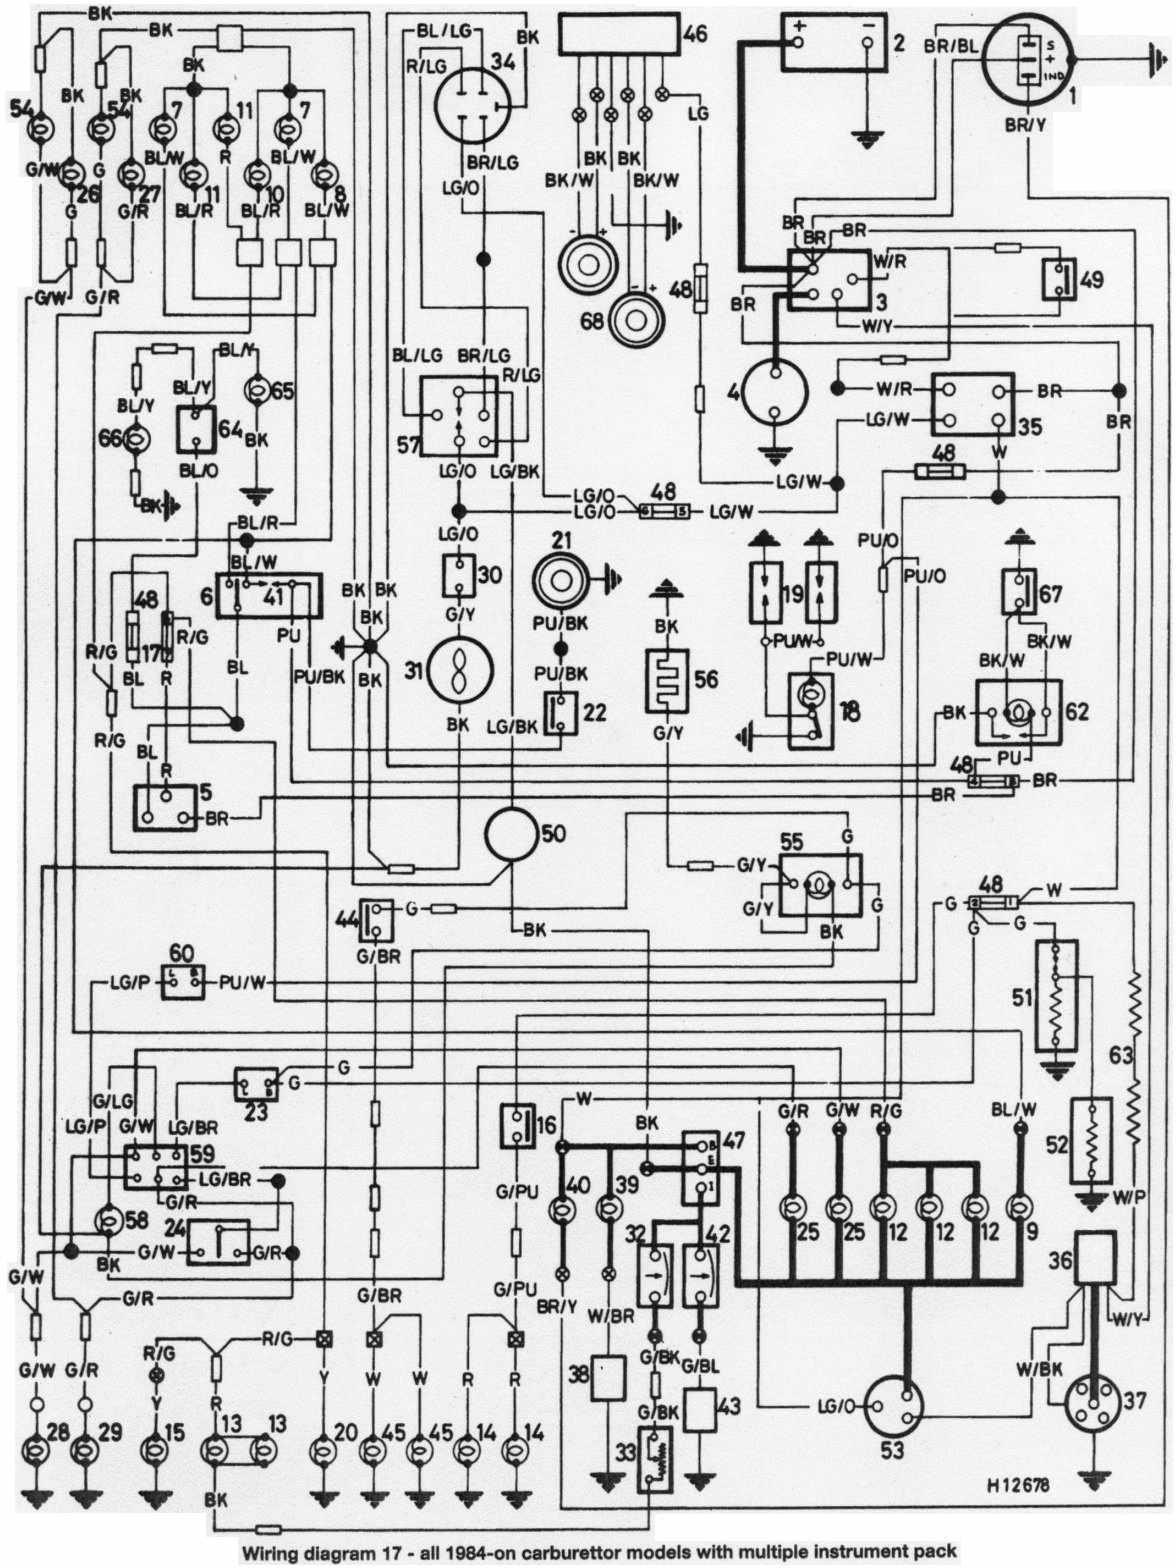 Basic Mini Wiring Diagram - House Wiring Diagram Symbols •